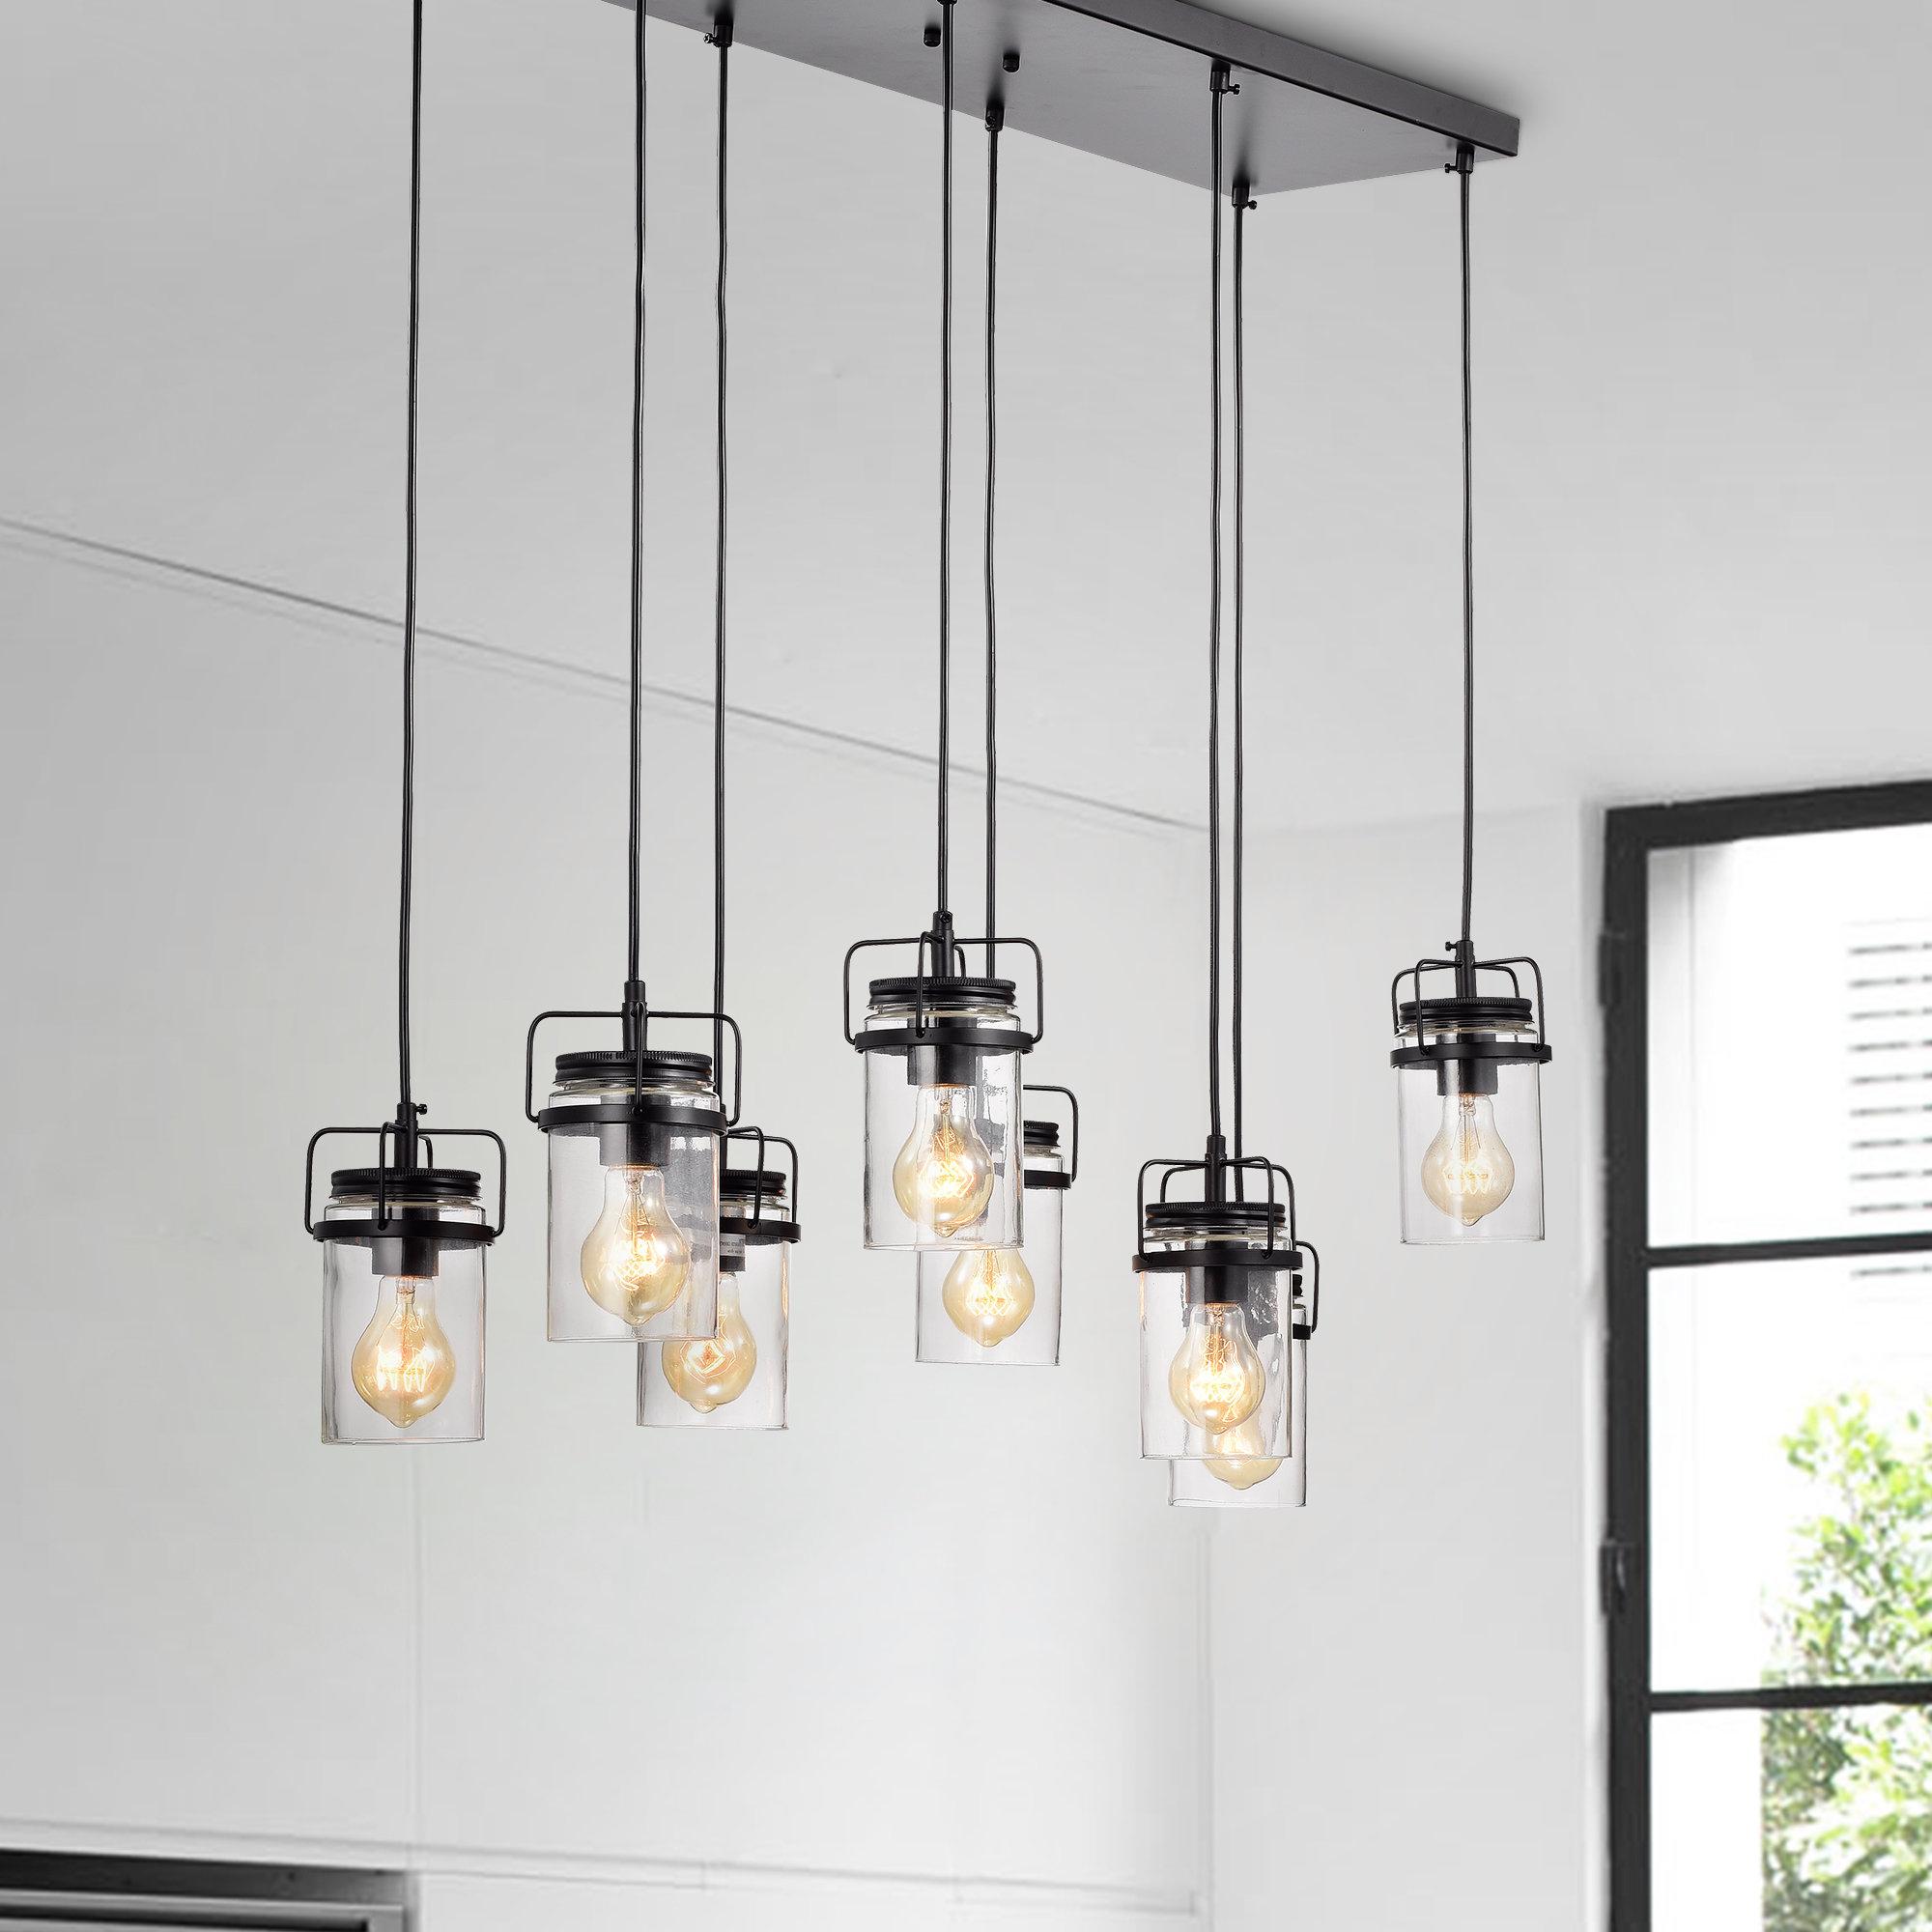 Donald 8 Light Cluster Pendant With Popular Pruett Cognac Glass 8 Light Cluster Pendants (View 2 of 20)